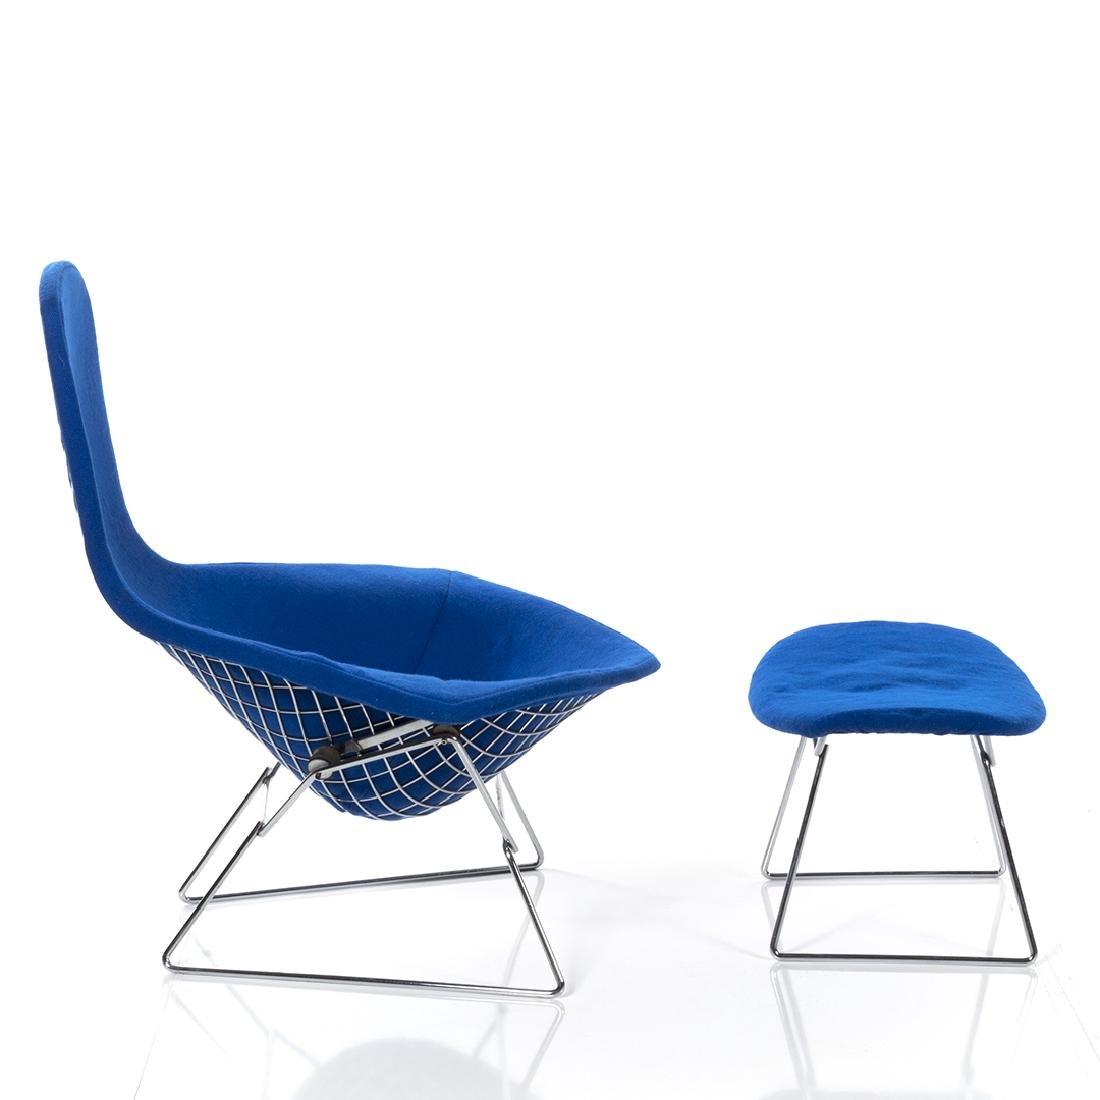 Harry Bertoia Bird Chair and Ottoman - 2